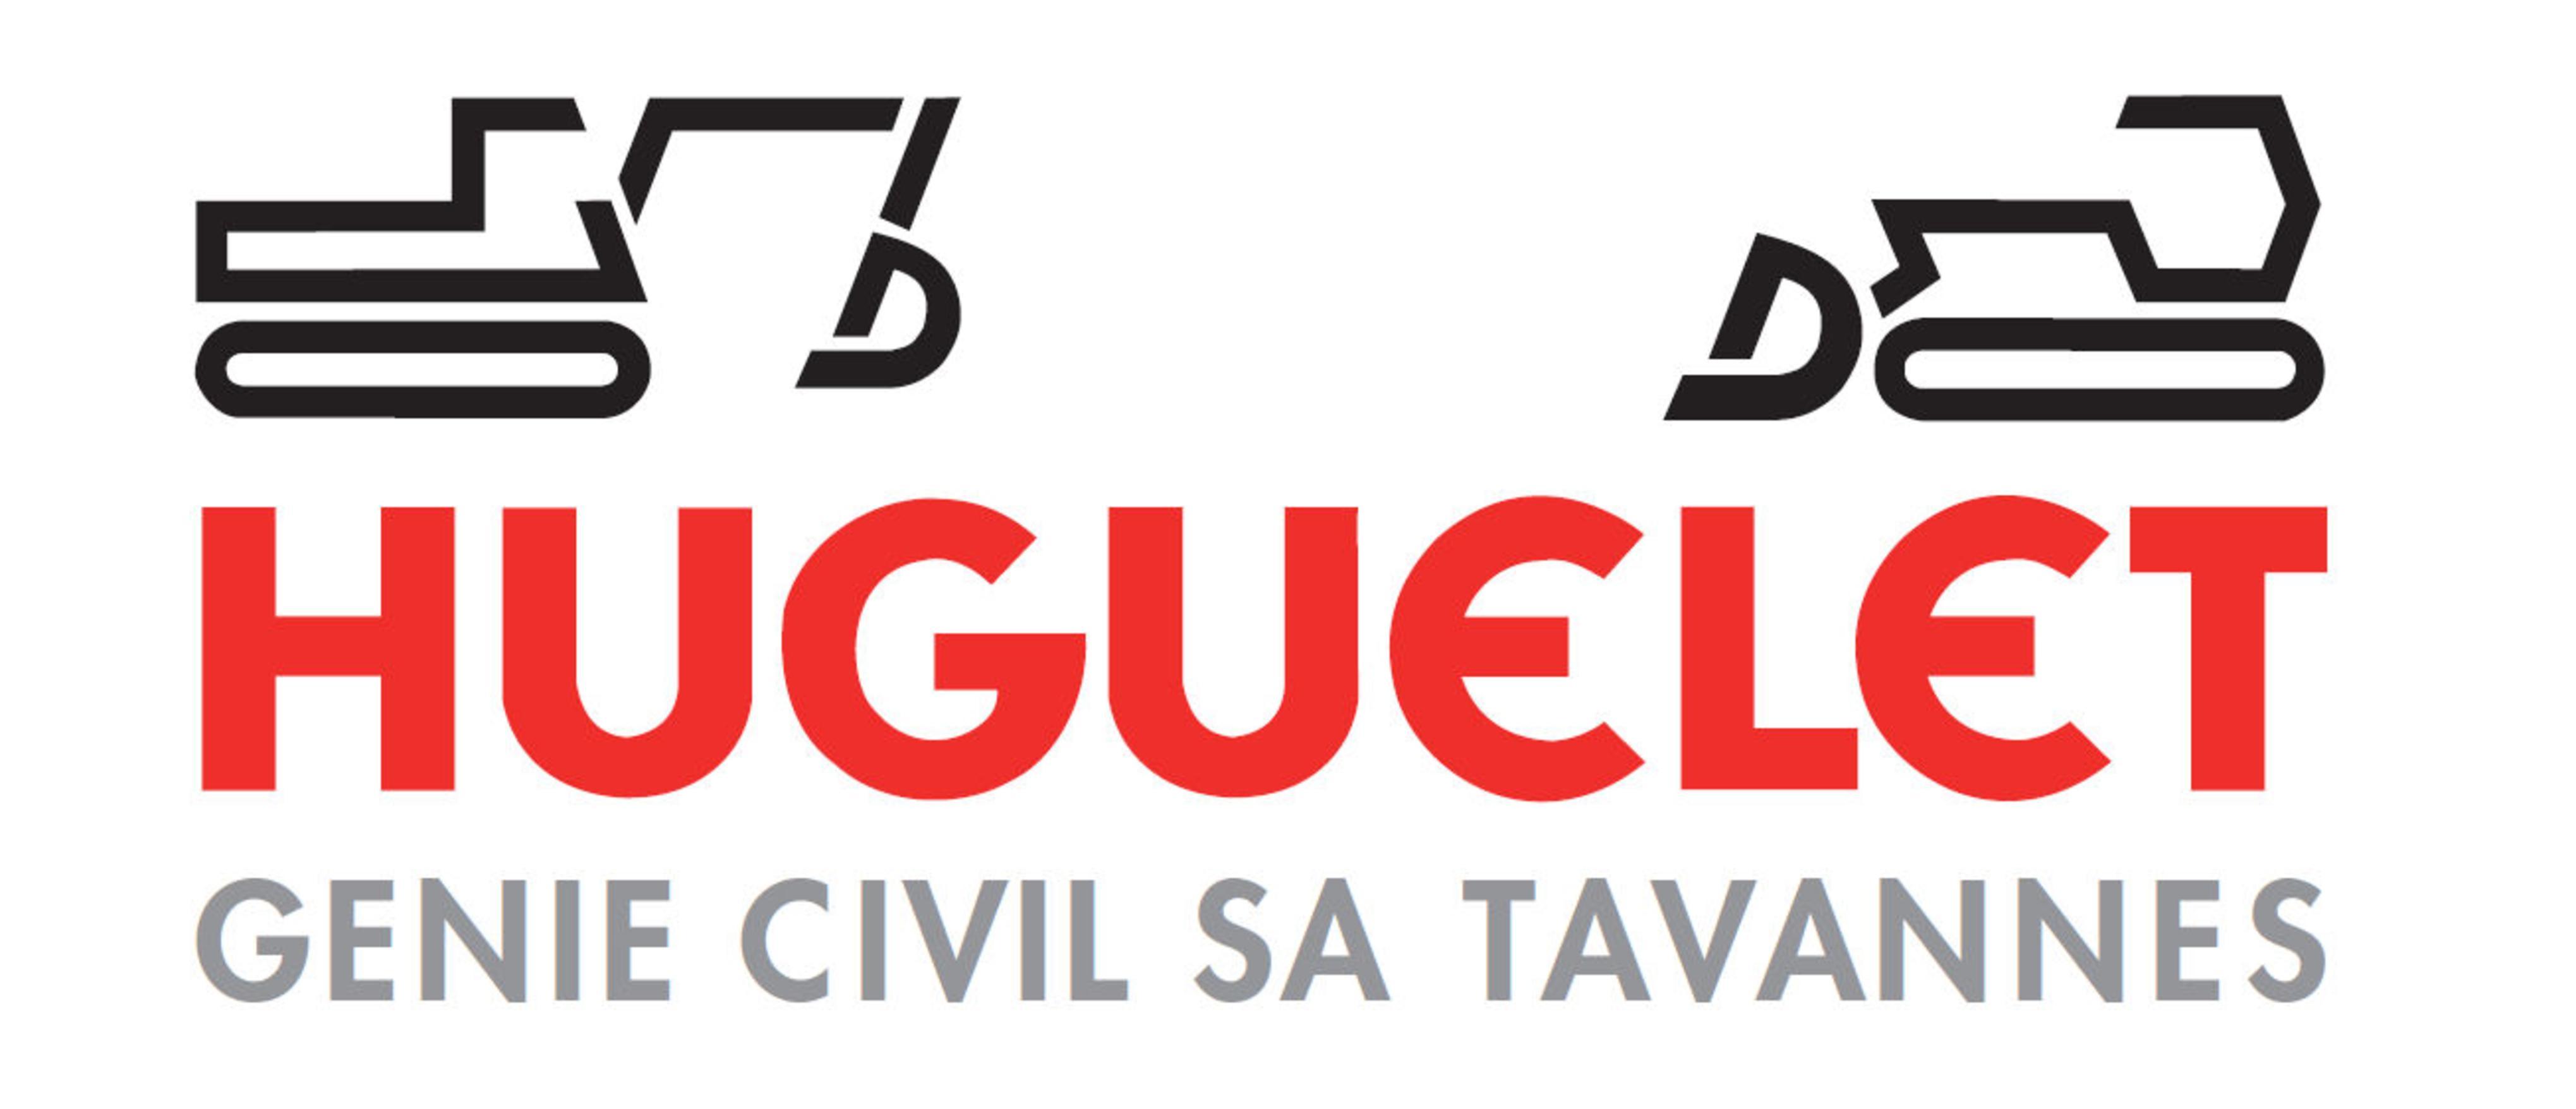 huguelet